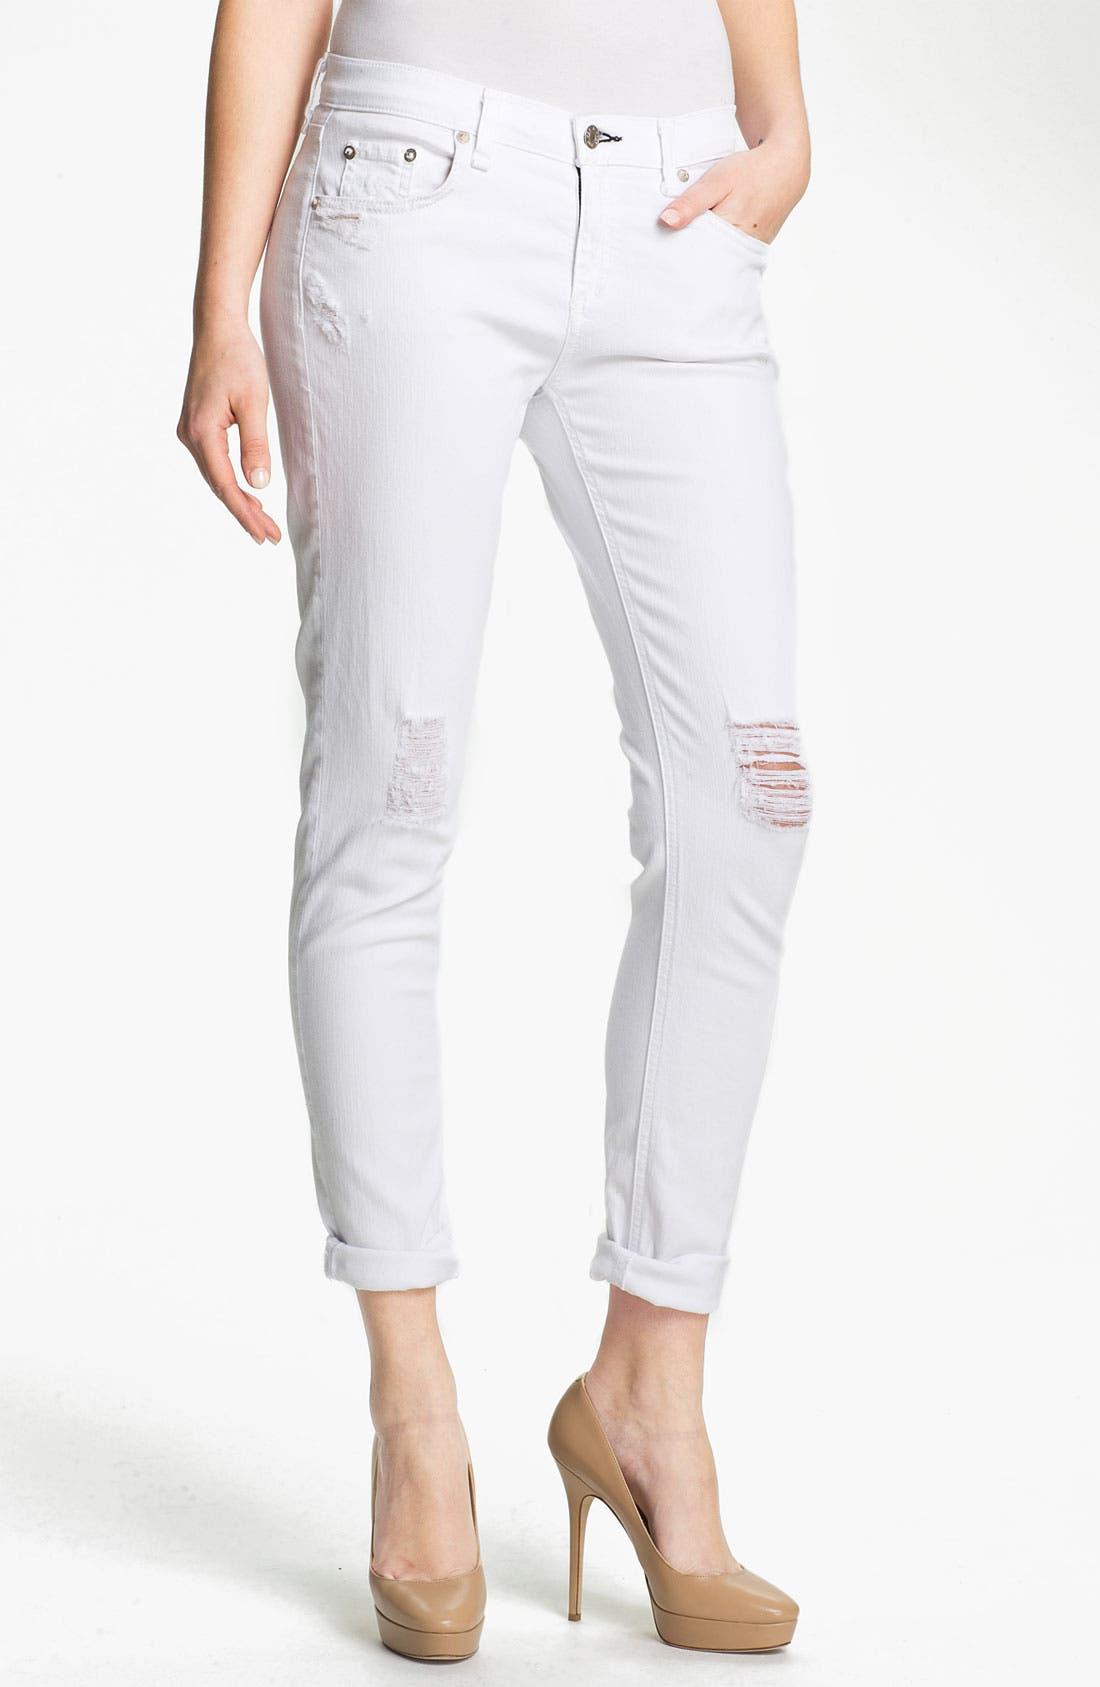 Alternate Image 1 Selected - rag & bone/JEAN 'The Dash' Slouchy Skinny Jeans